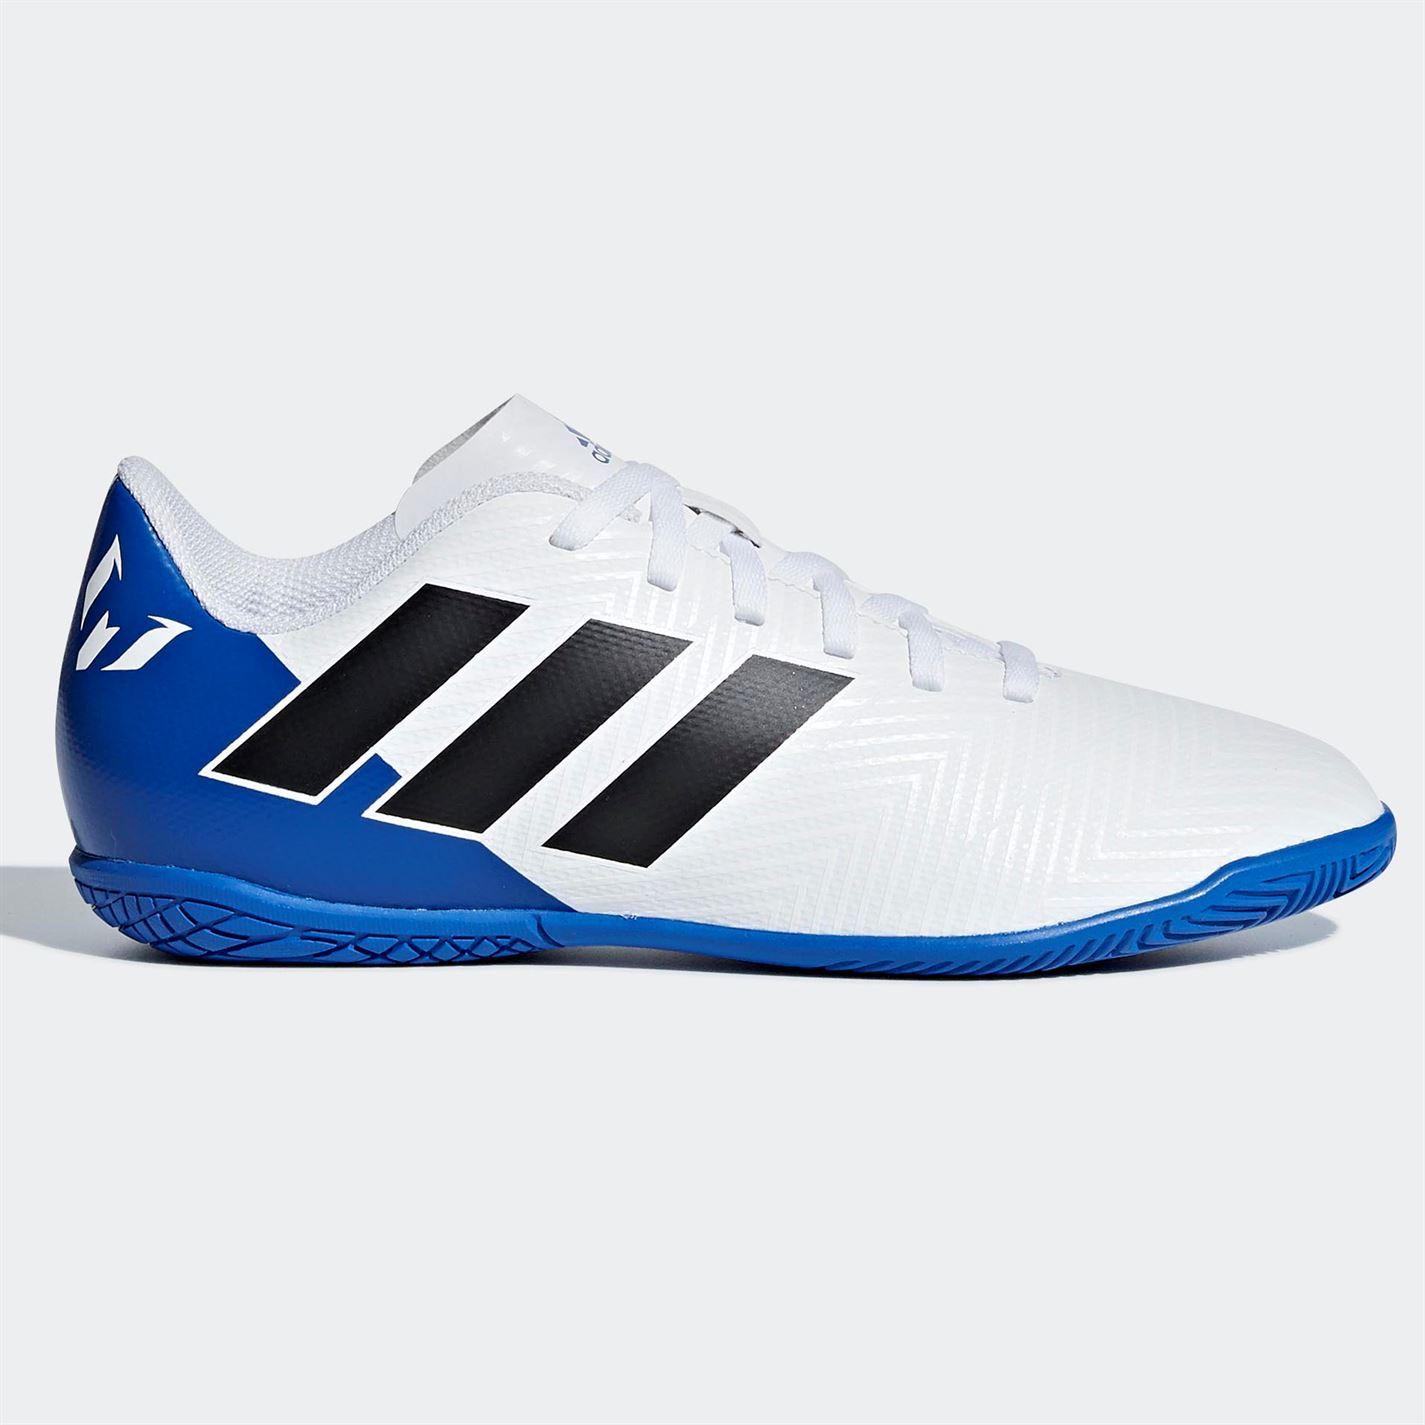 f38e0ab462aa adidas Nemeziz Messi Tango 18.4 Indoor Football Trainers Juniors ...